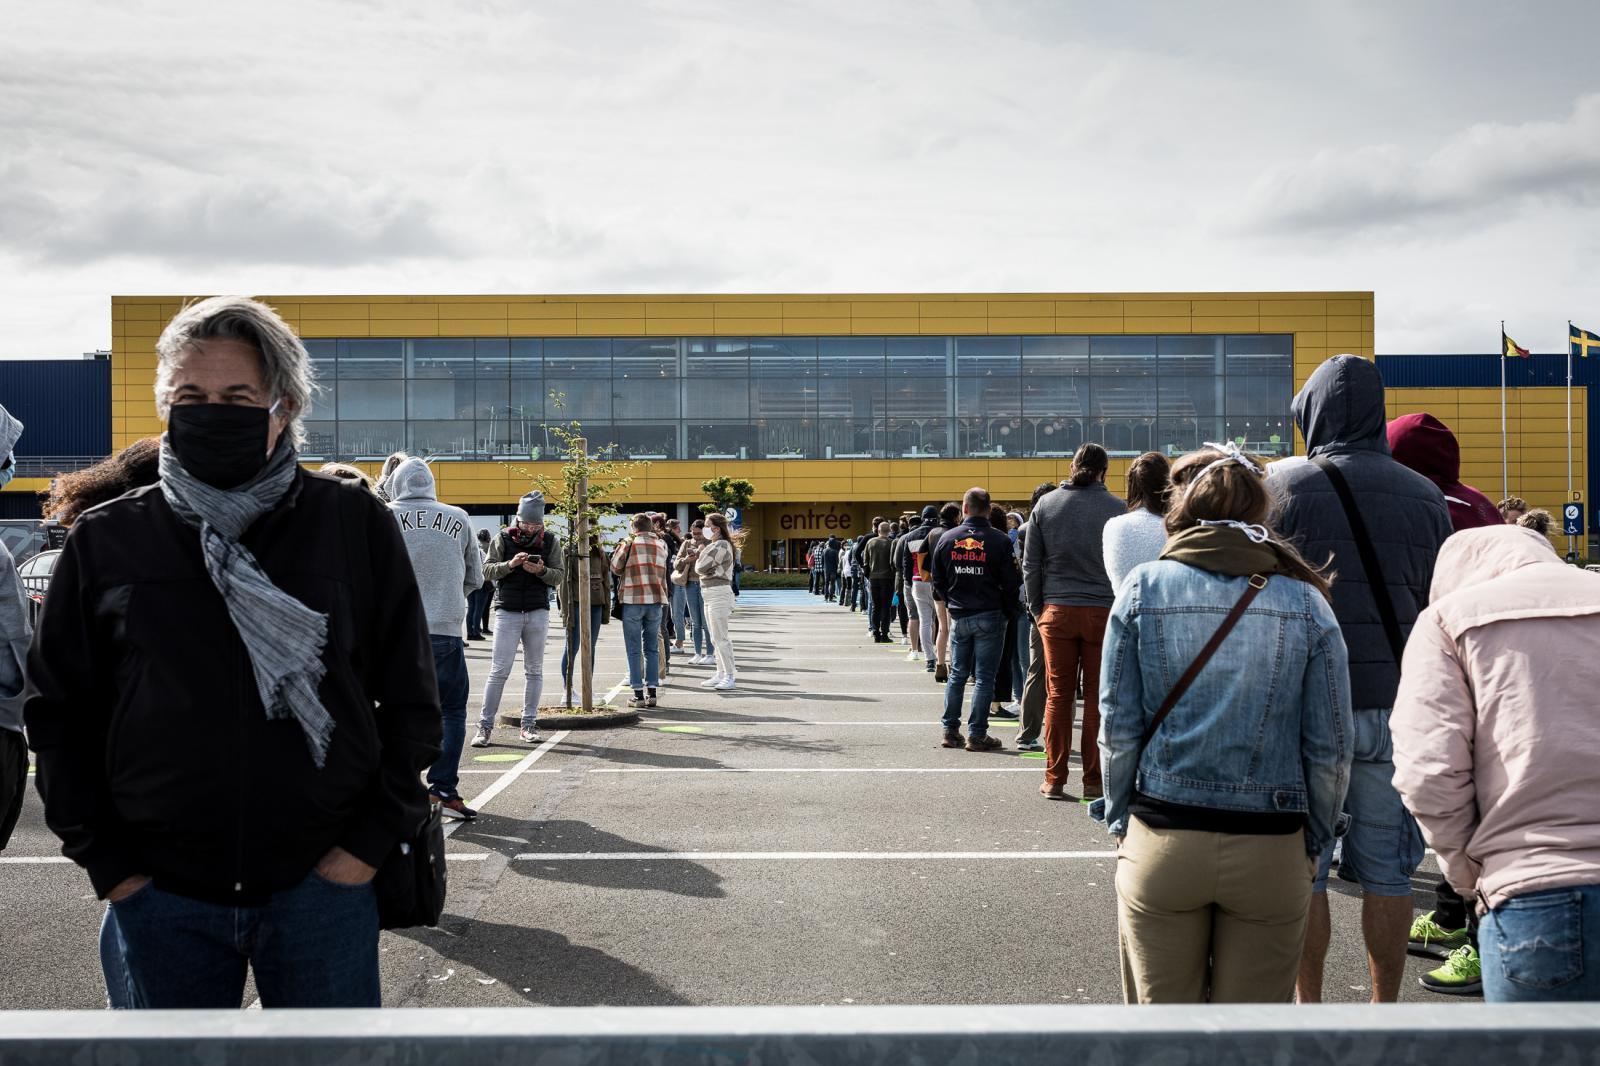 Photography image - Loading 01_IKEA_Belgium_20200511.jpg